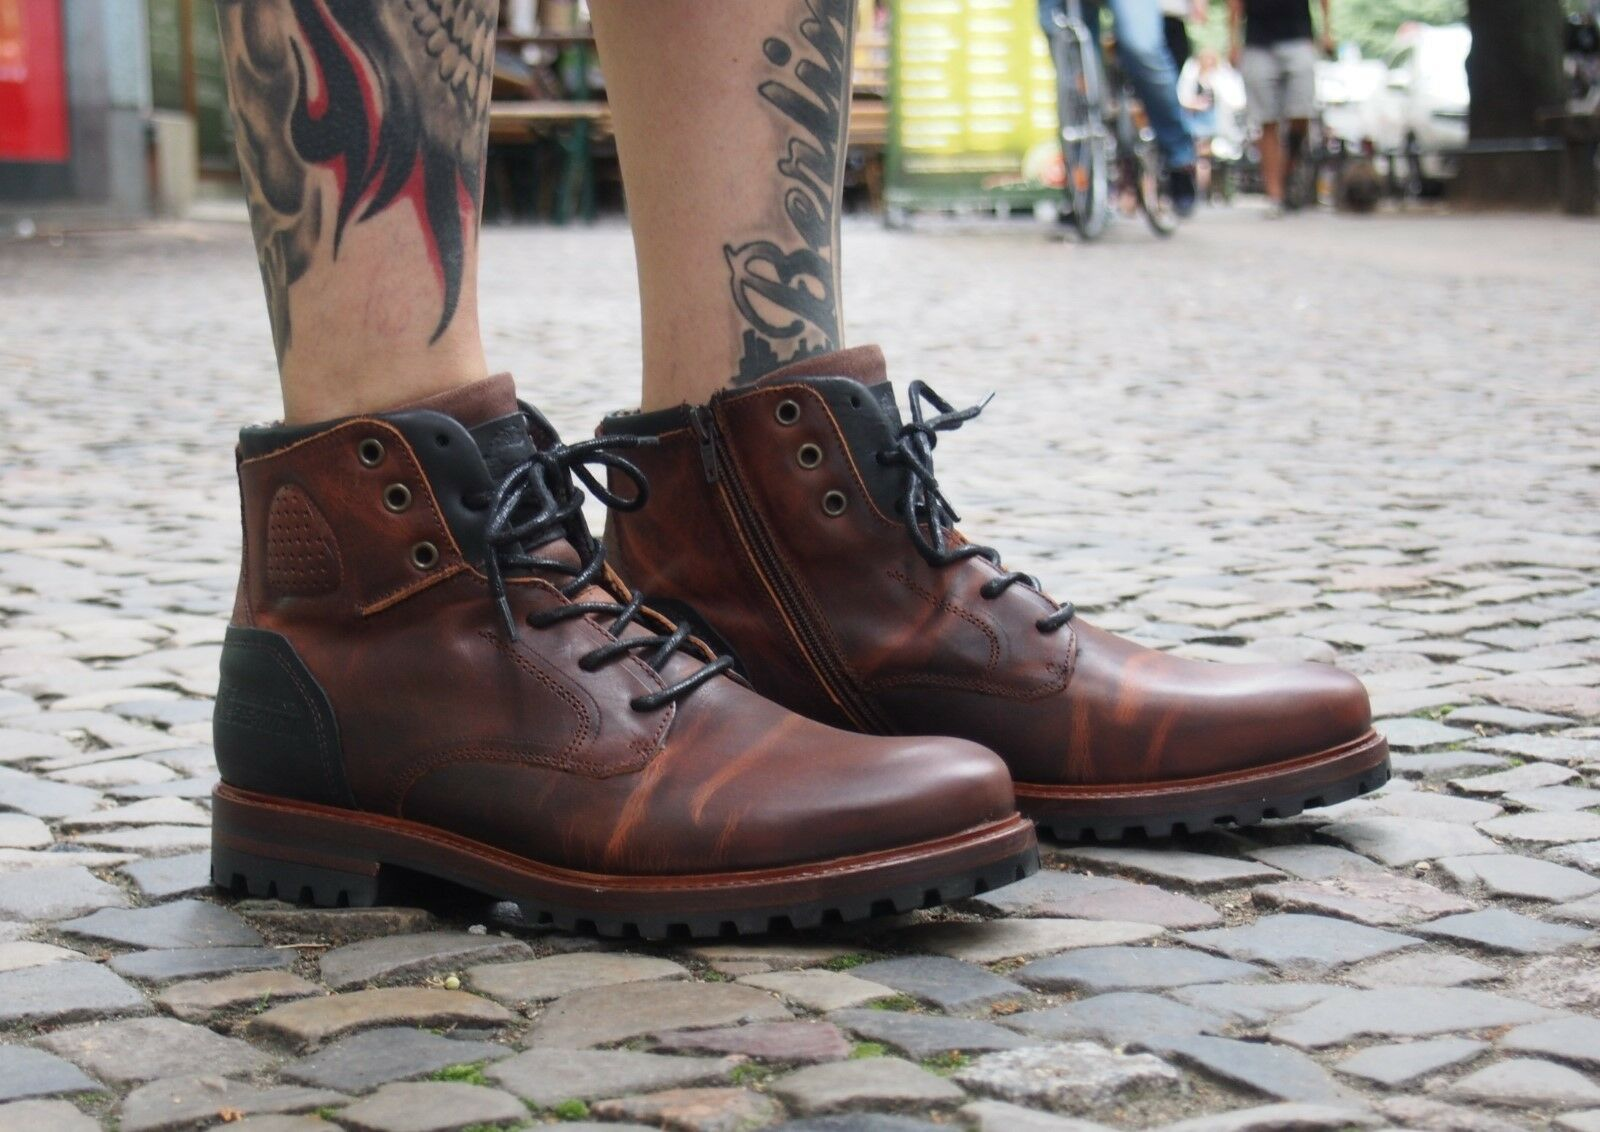 Bullboxer Schuh 10 632 braun Herrenschuhe SALE Stiefel Echtleder Winterschuhe NEU SALE Herrenschuhe 6e6e98